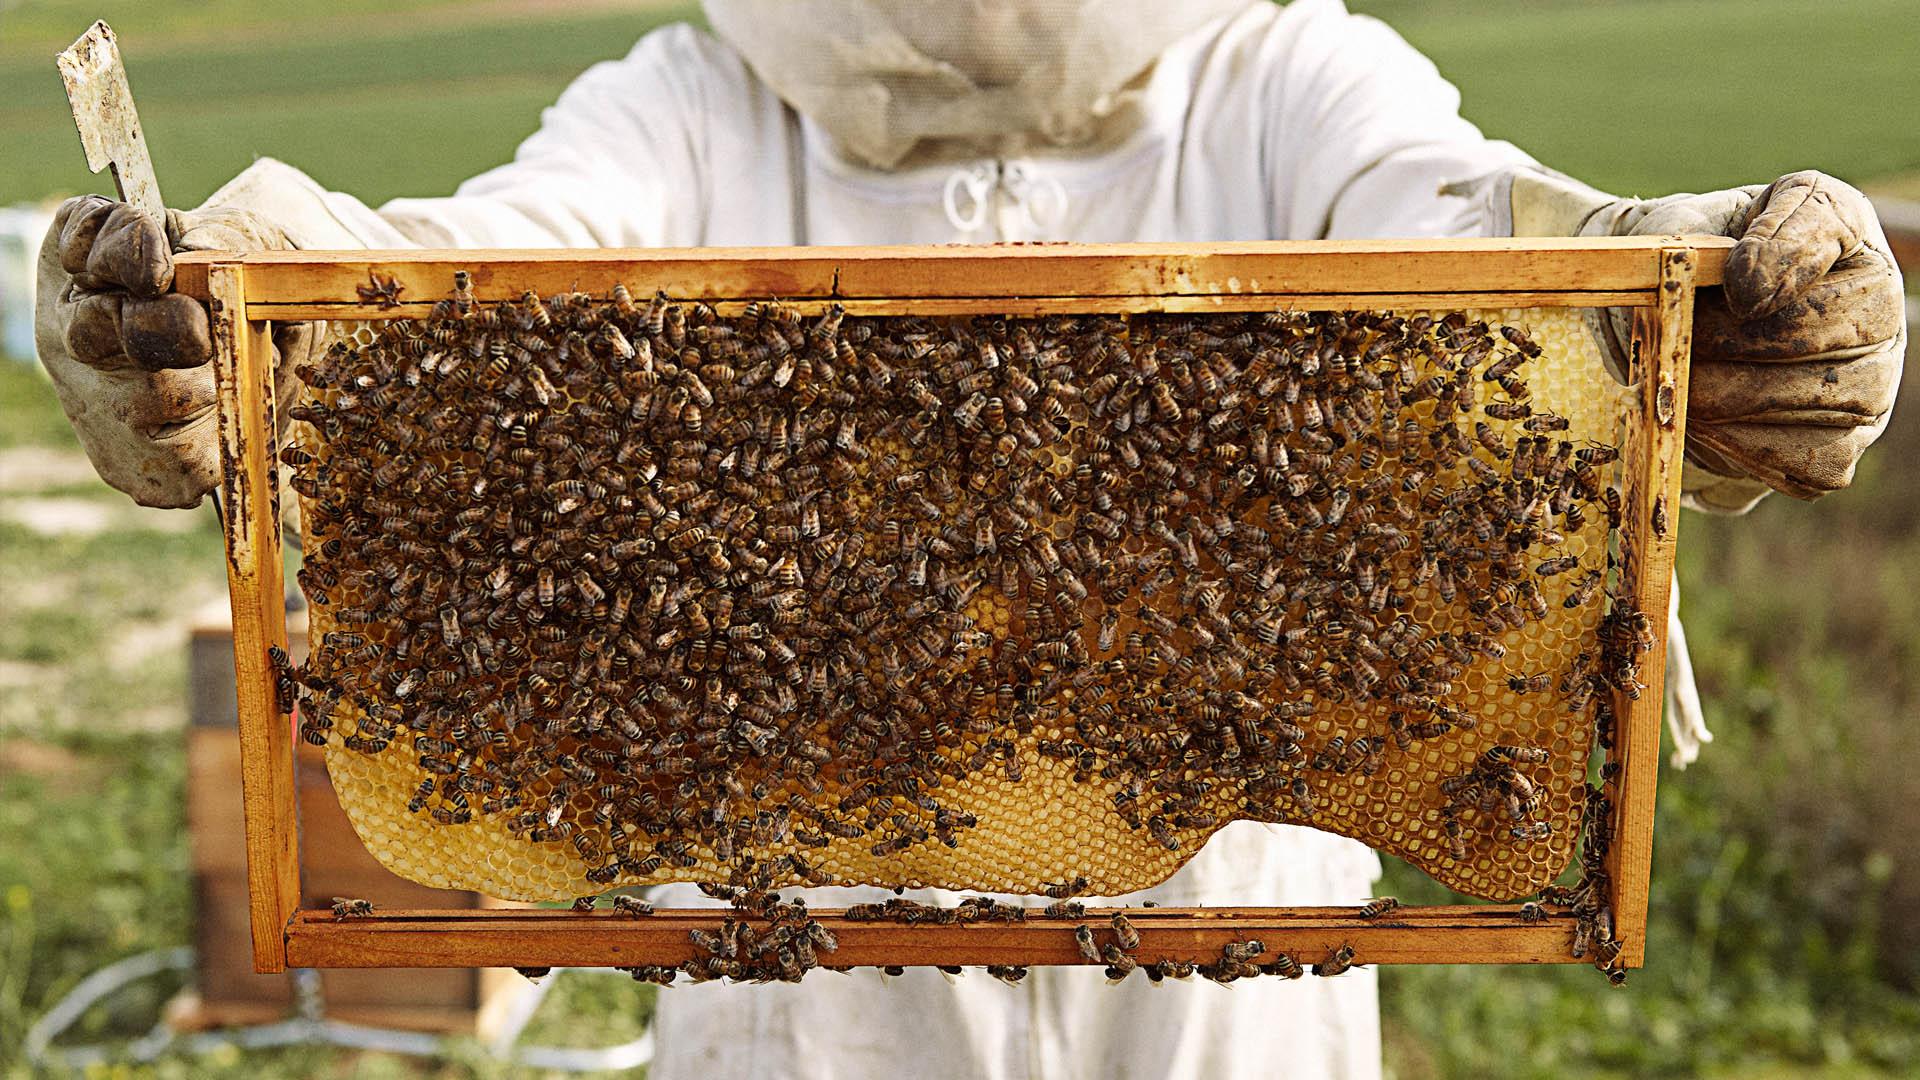 save the bees u2013 with natural backyard hives